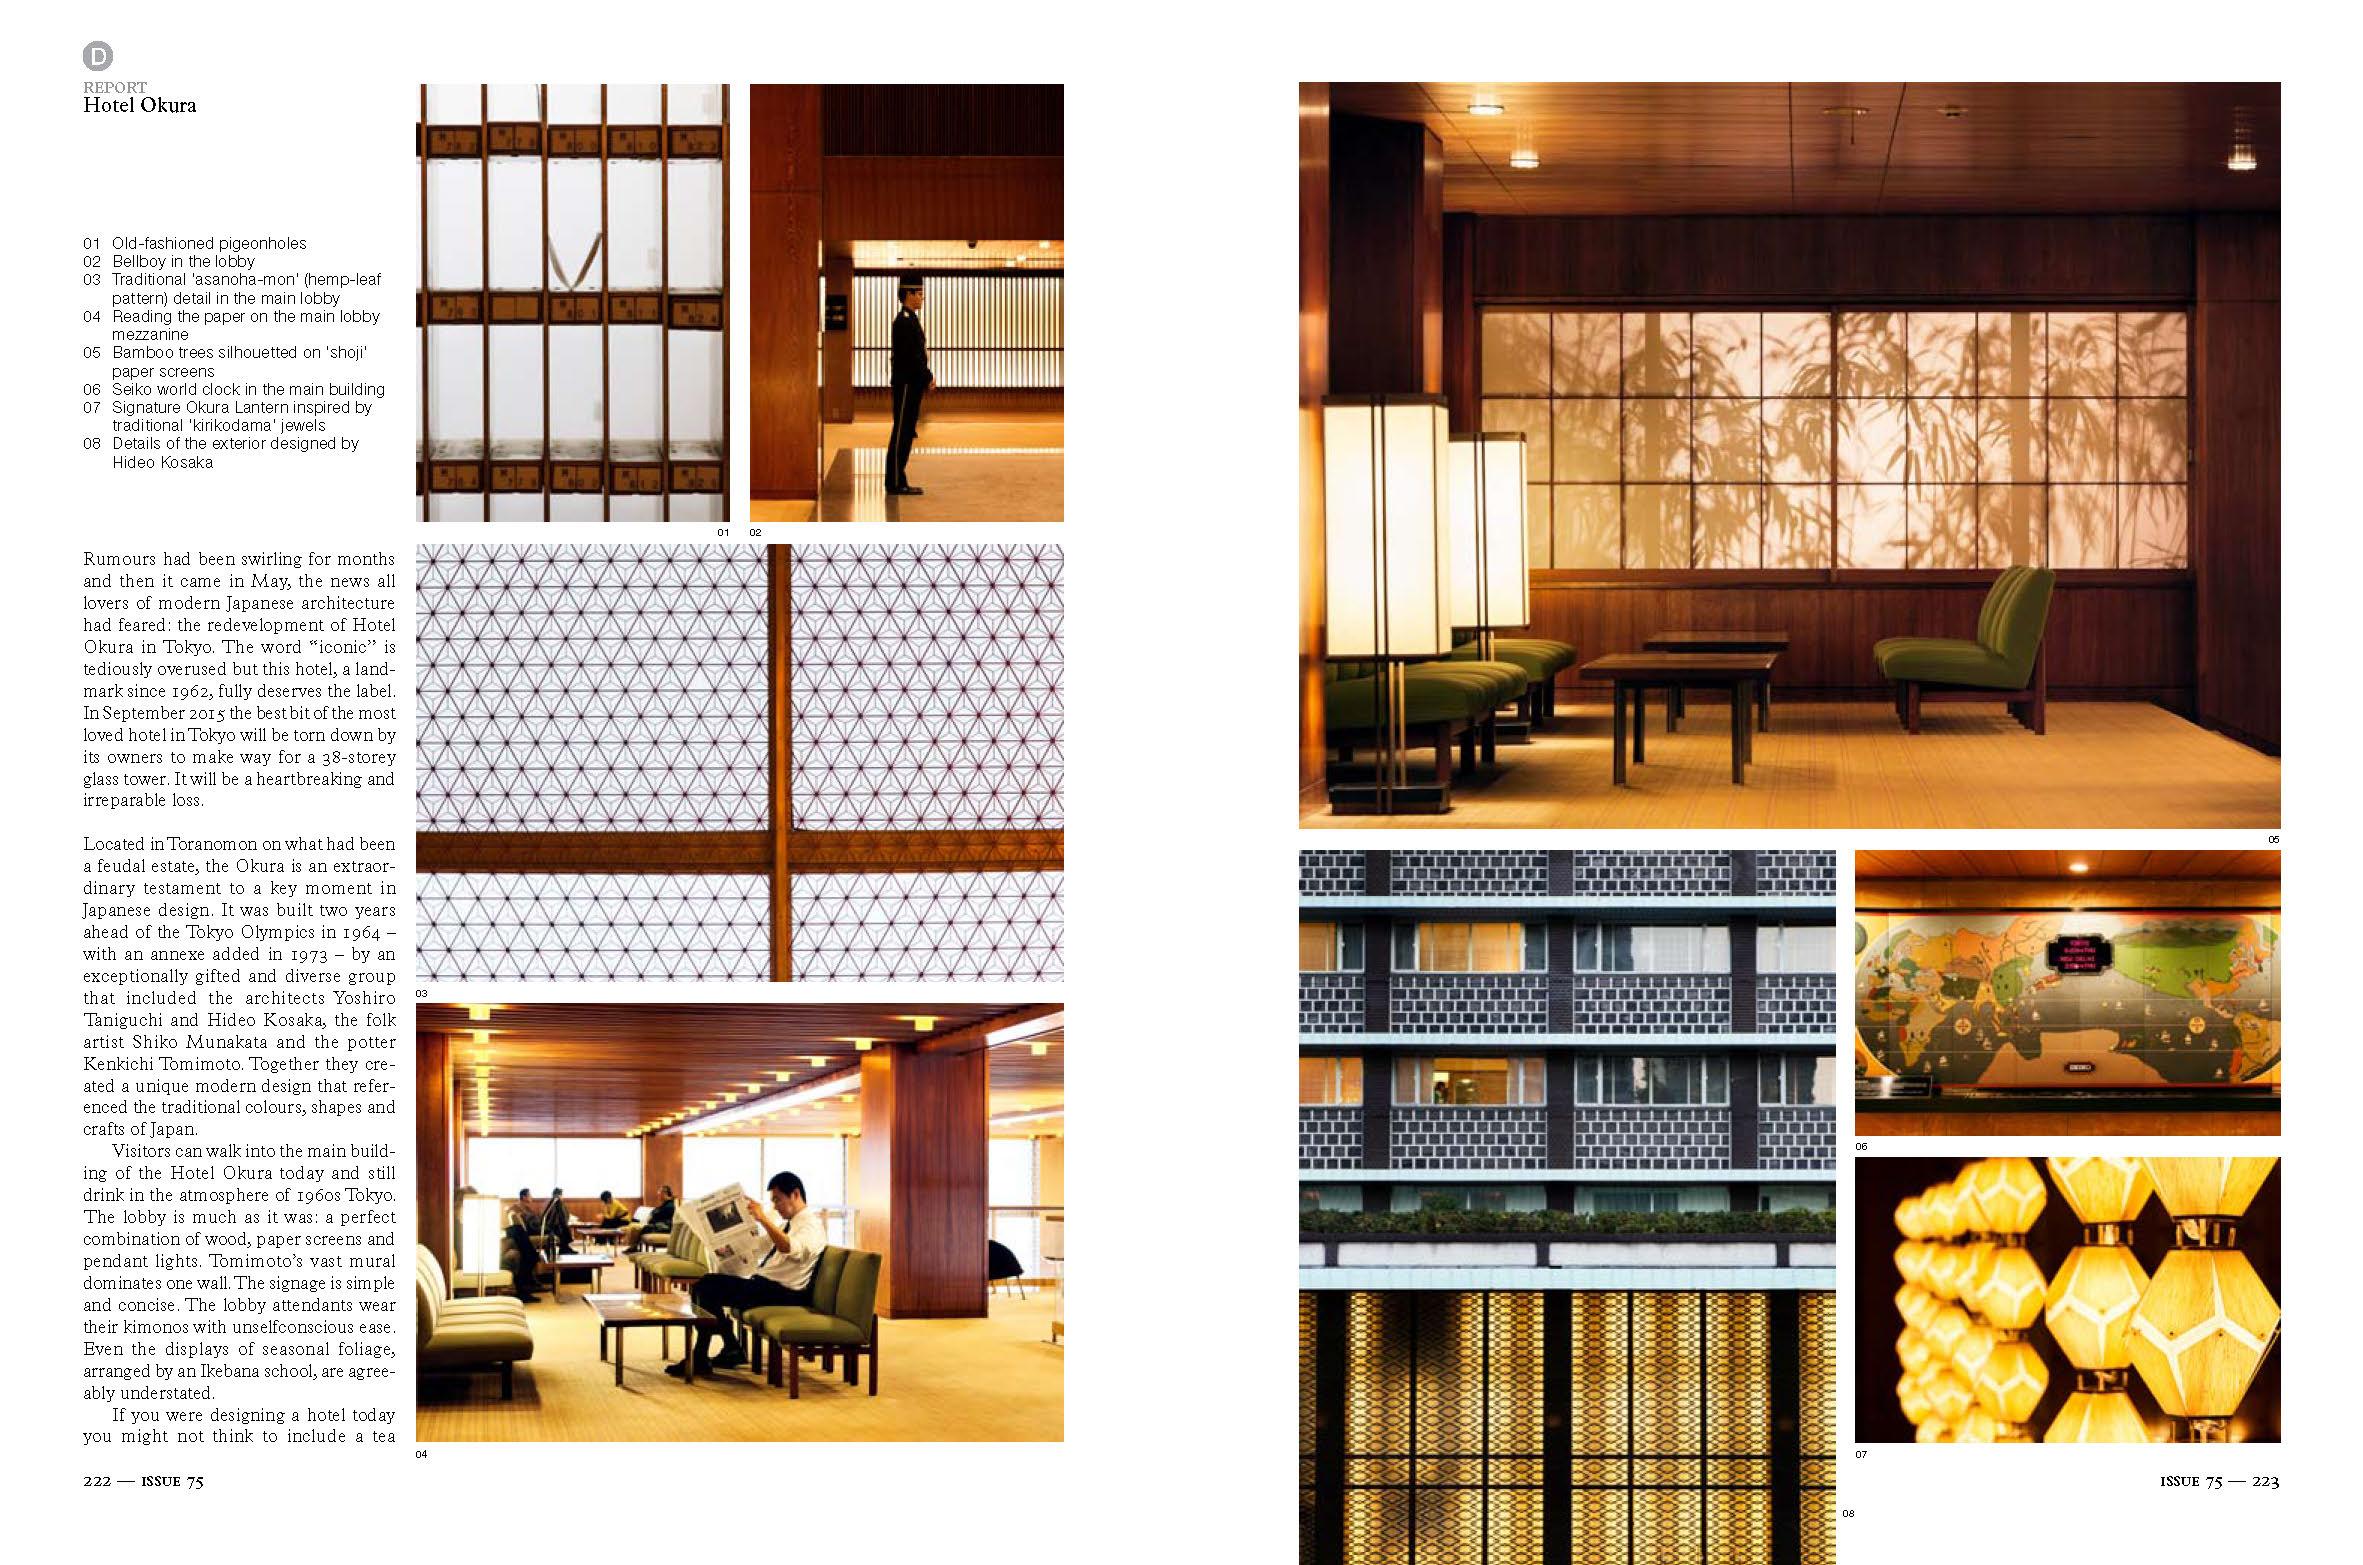 Martin Adolfsson - Hotel okura for monocle magazine